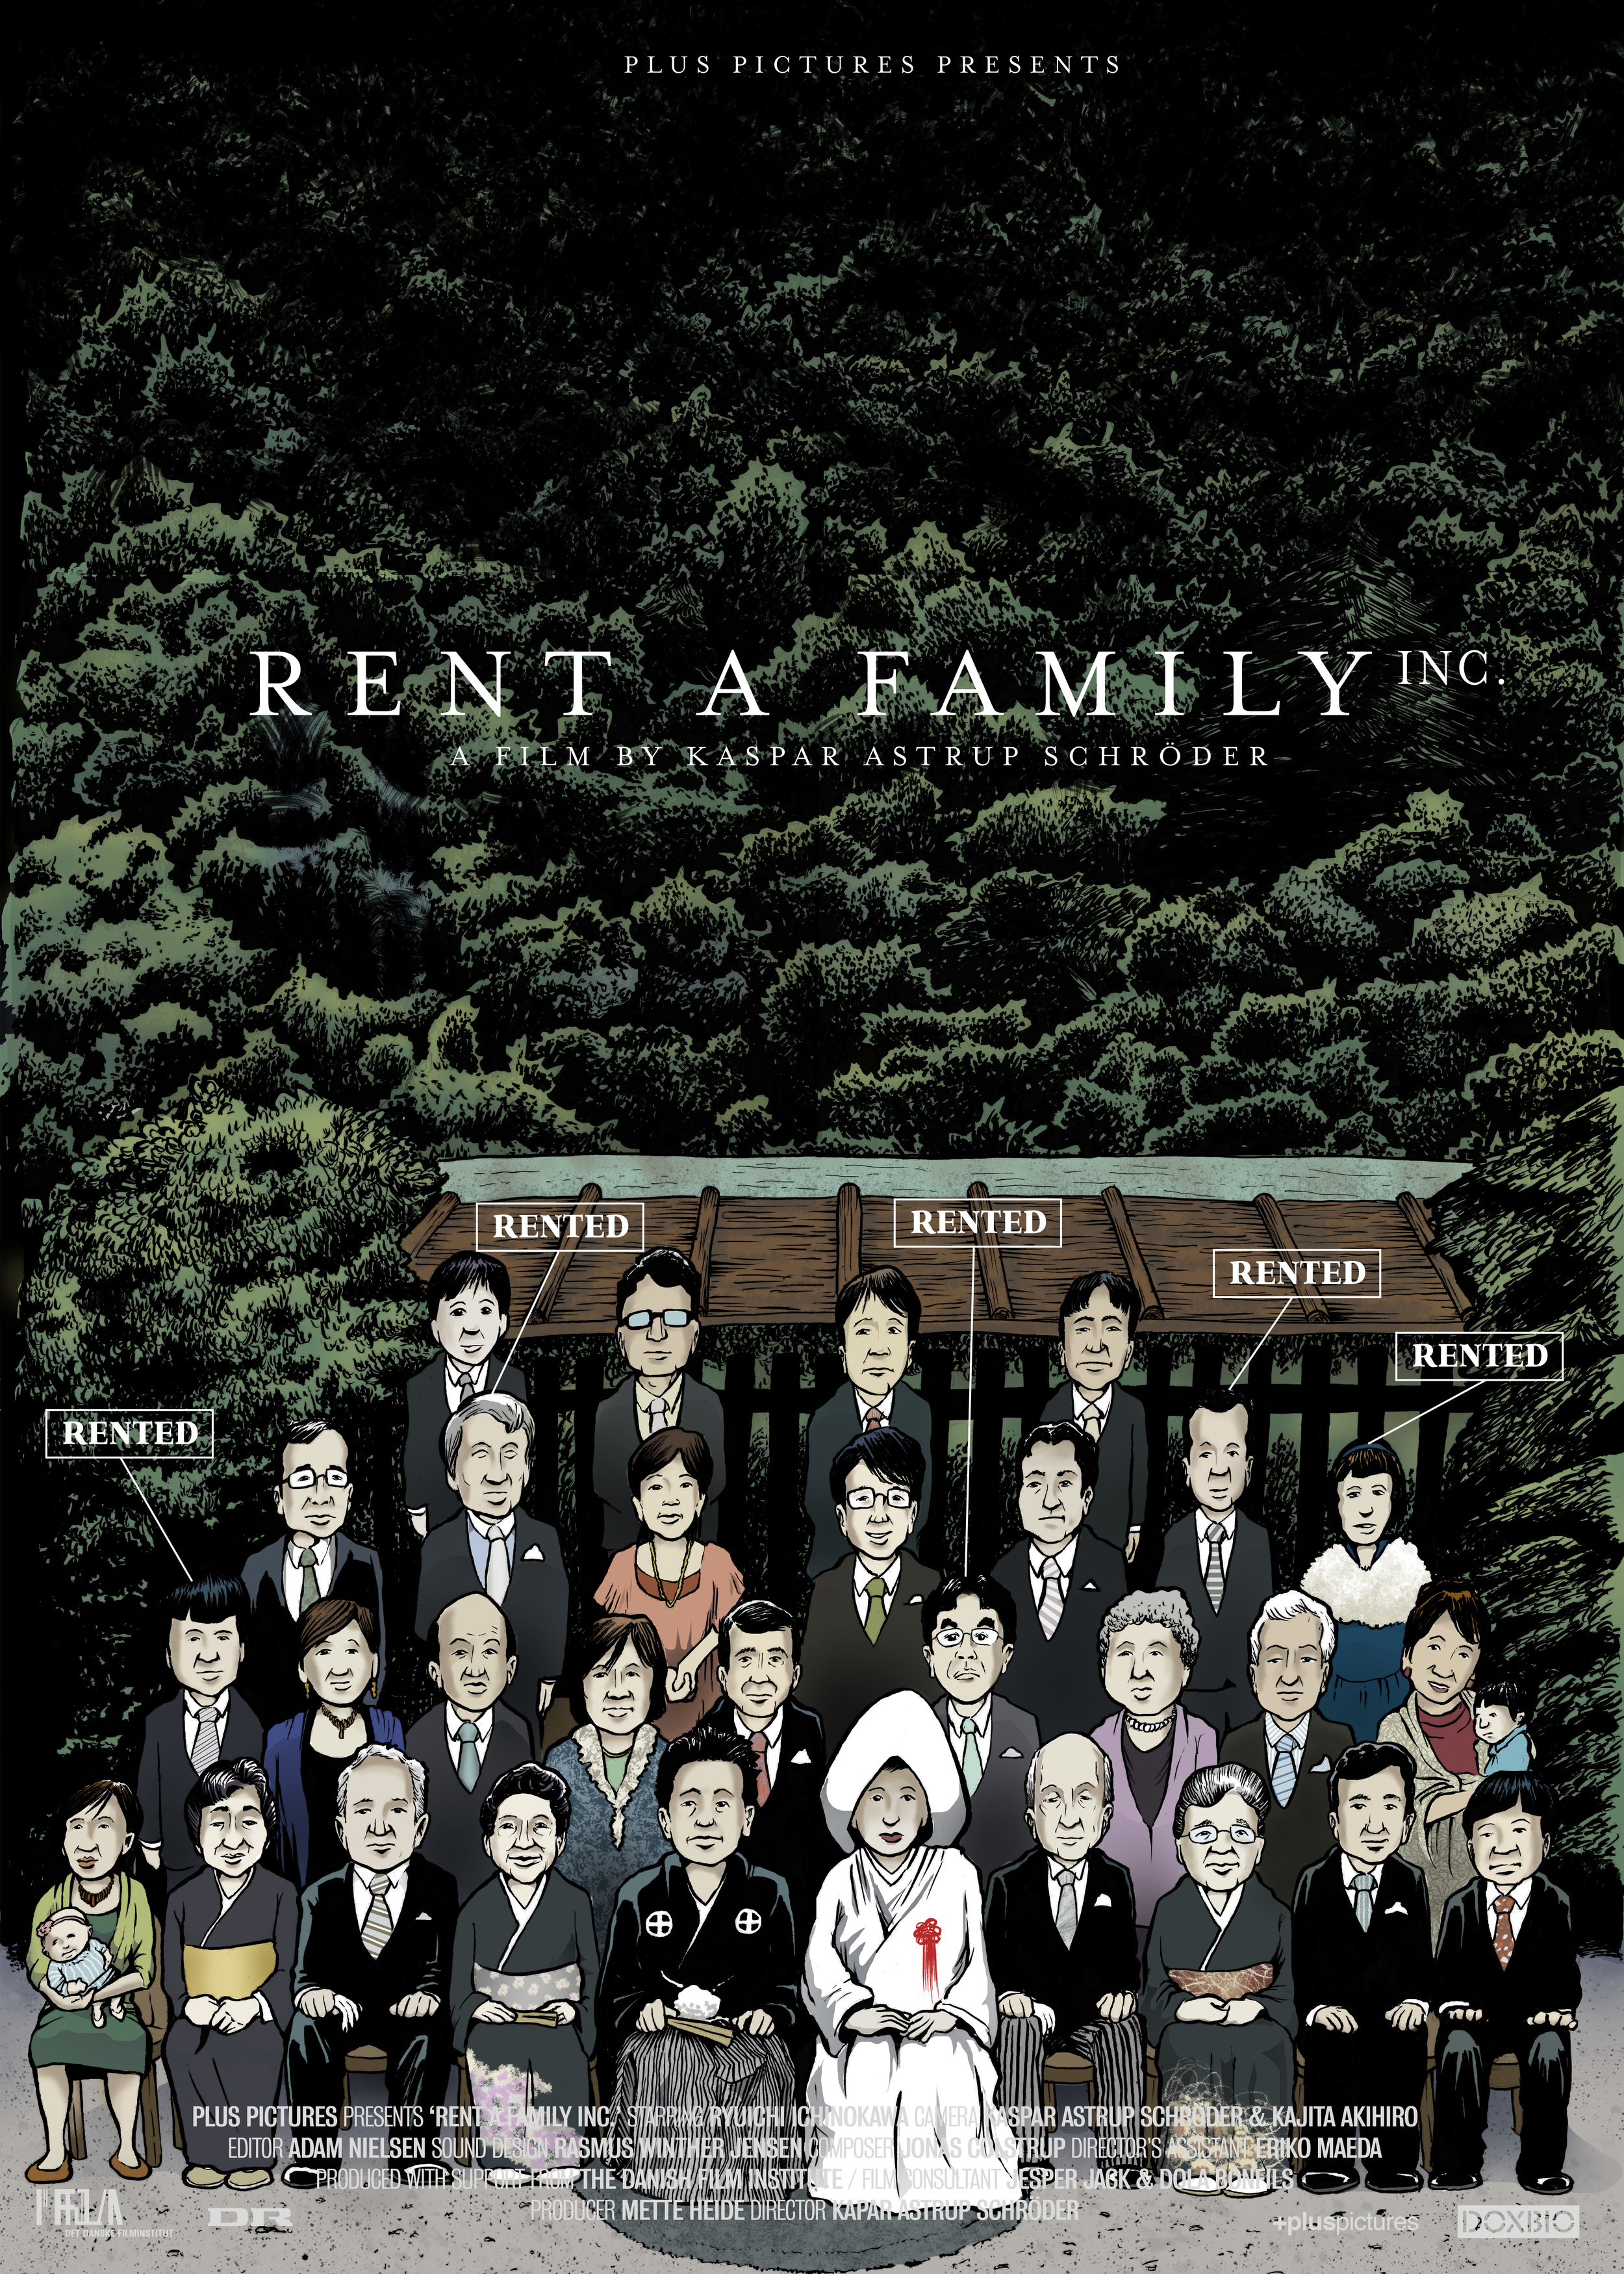 Lej en familie. Animated poster (1). Eng.jpg